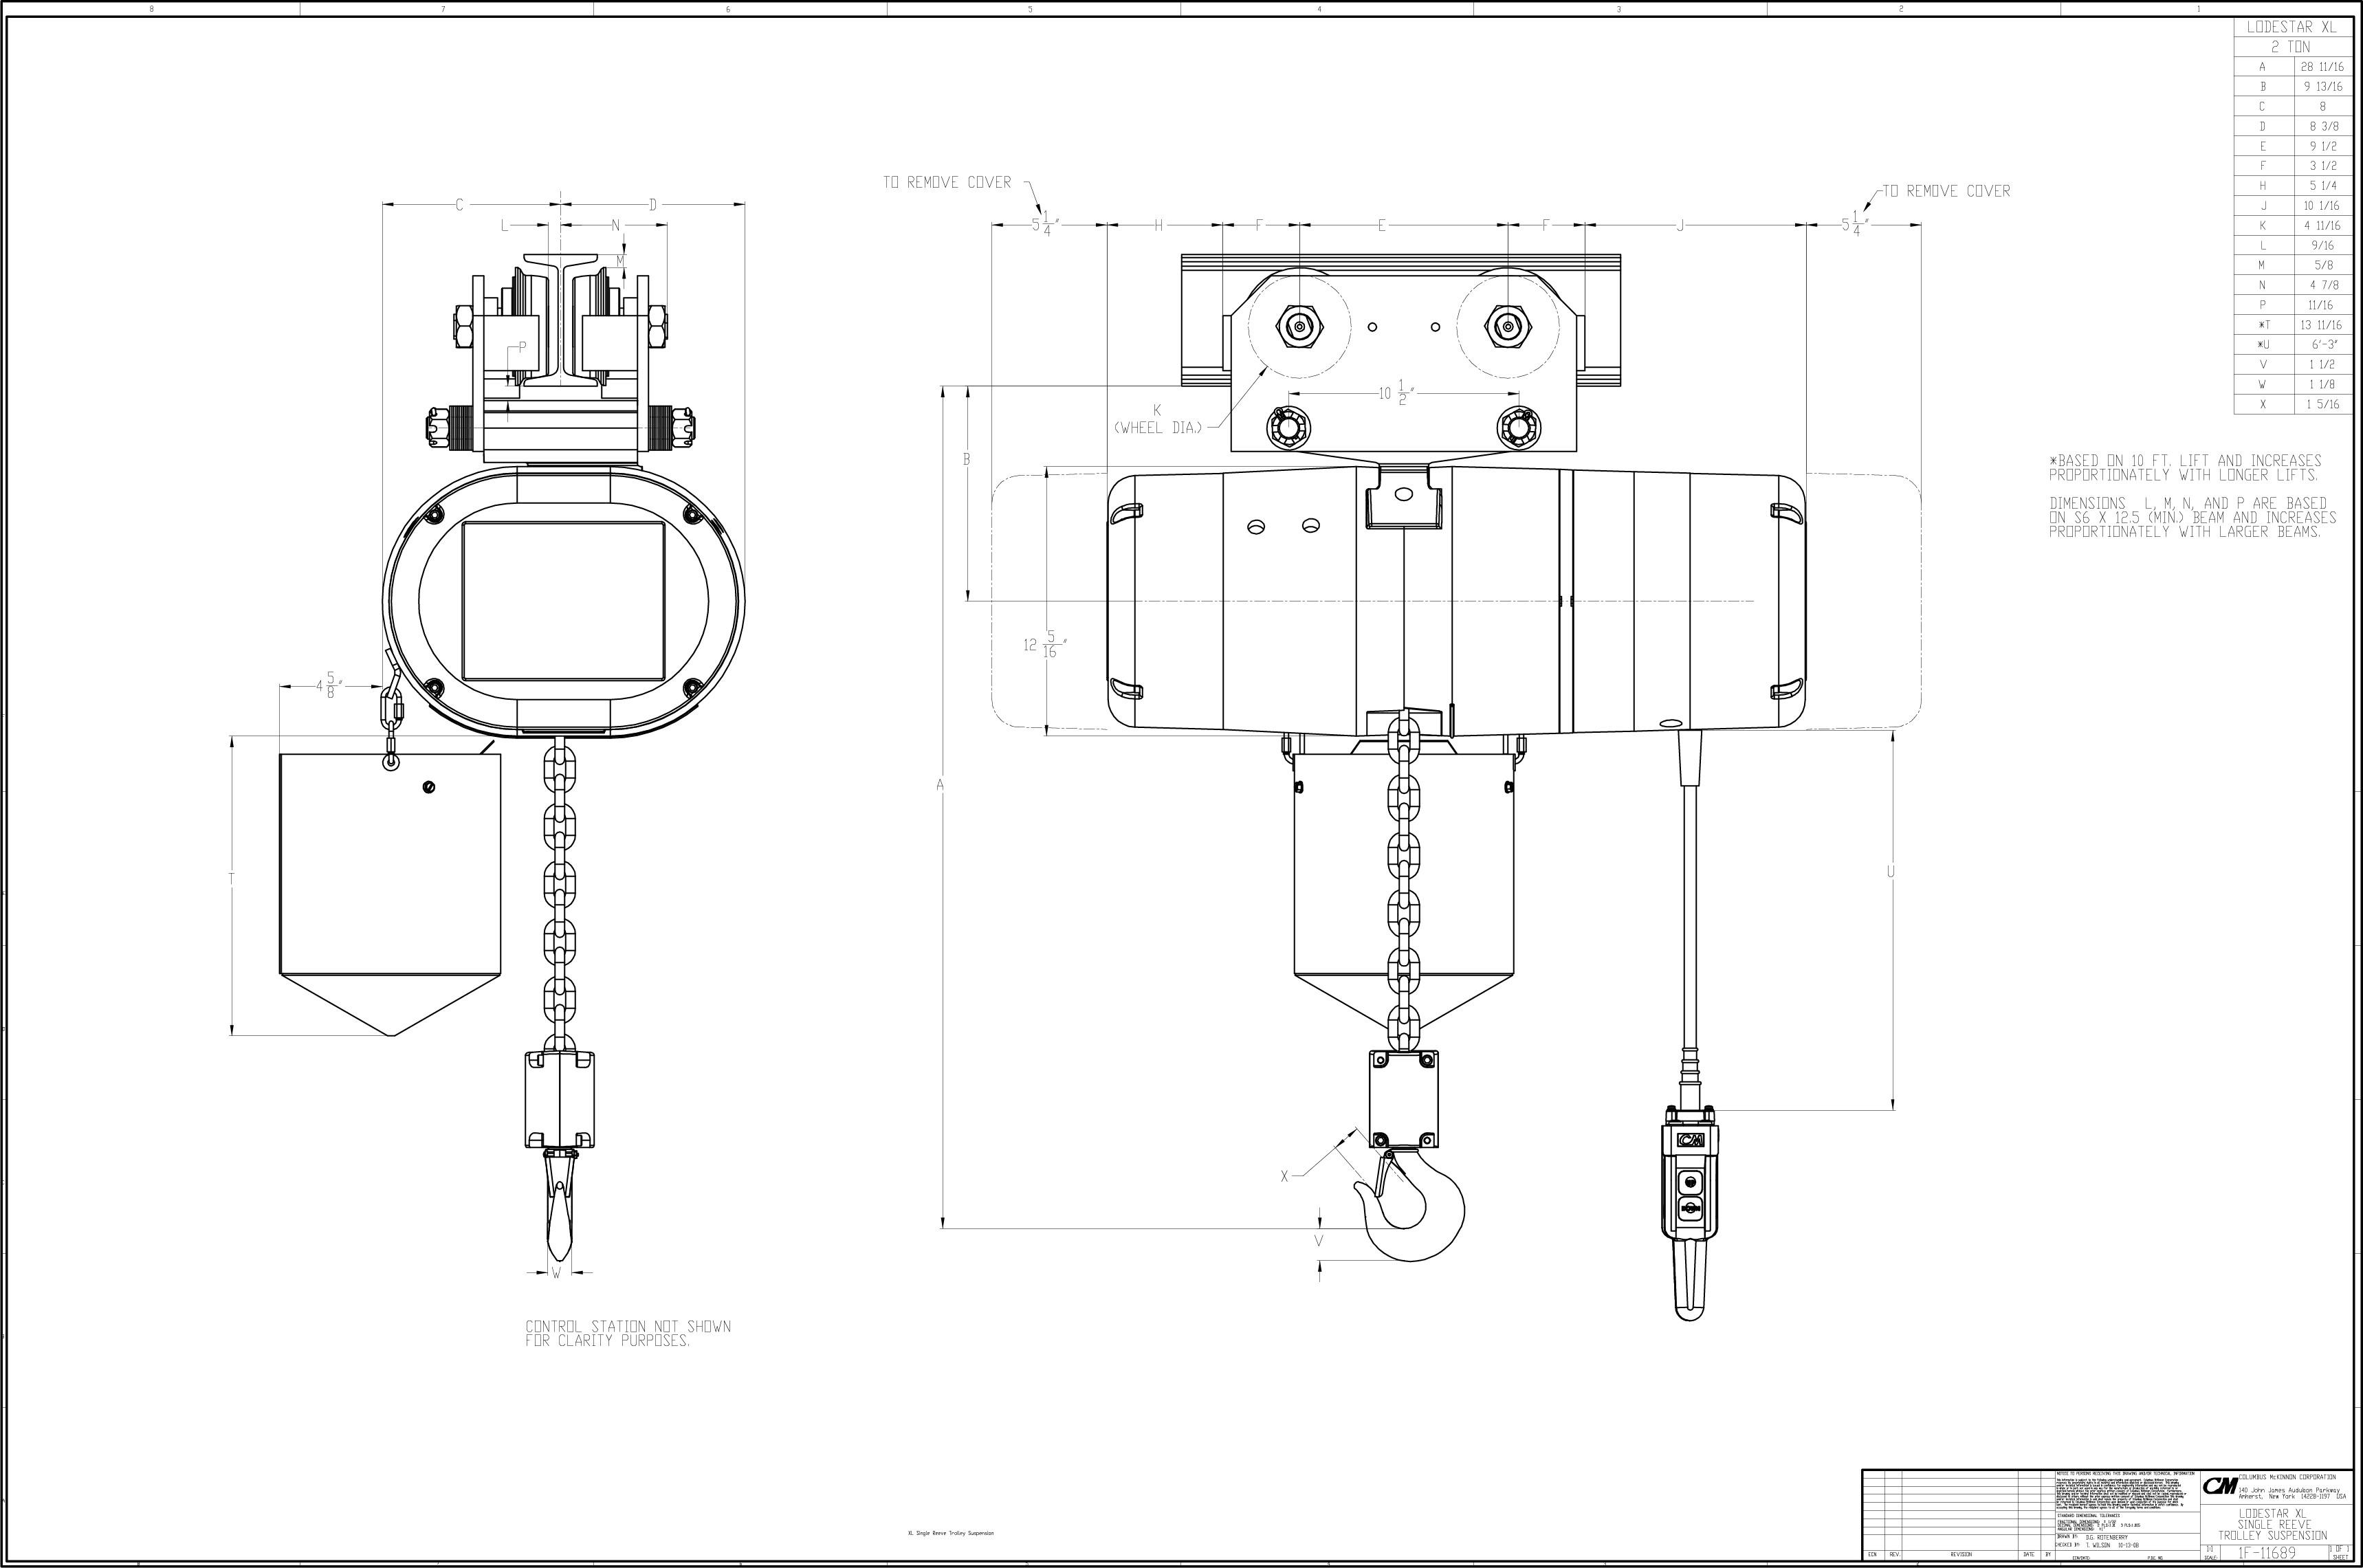 product code 5265p  cm lodestar xl electric chain hoist  230  460